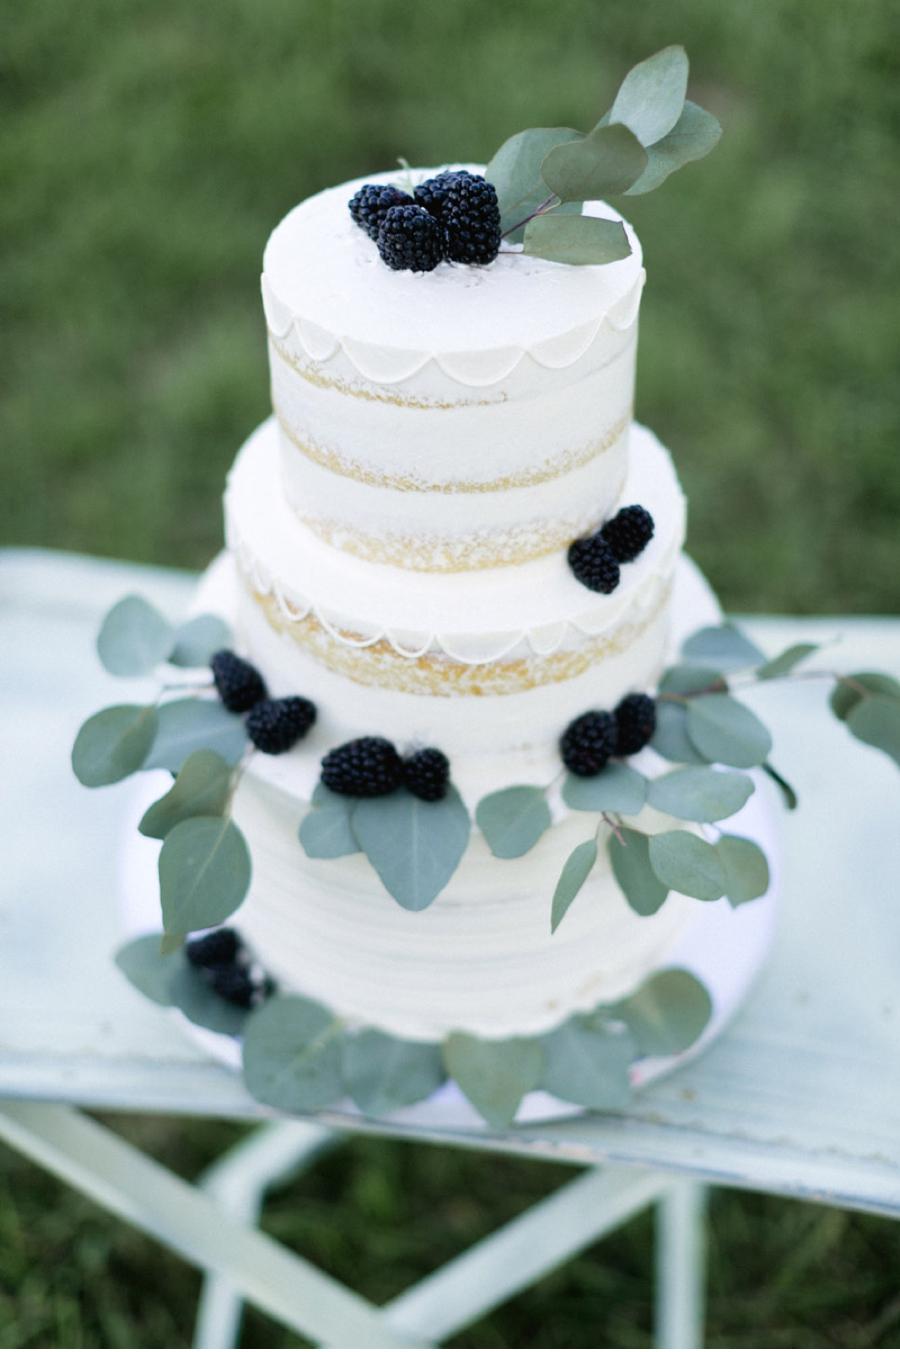 Three-Tiered-Wedding-Cake-with-Blackberries